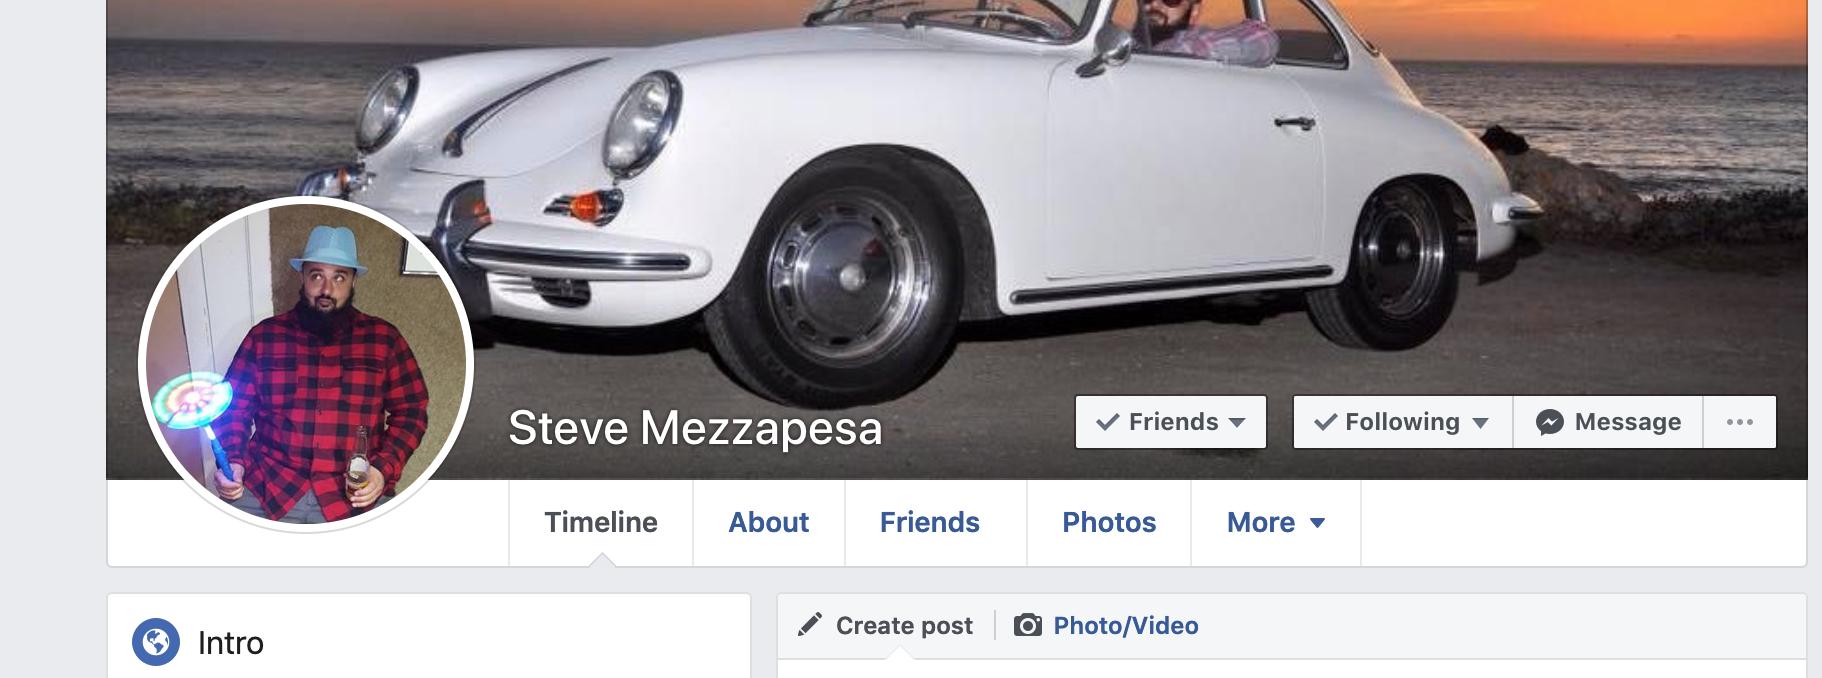 Steve Mezzapesas Facebook